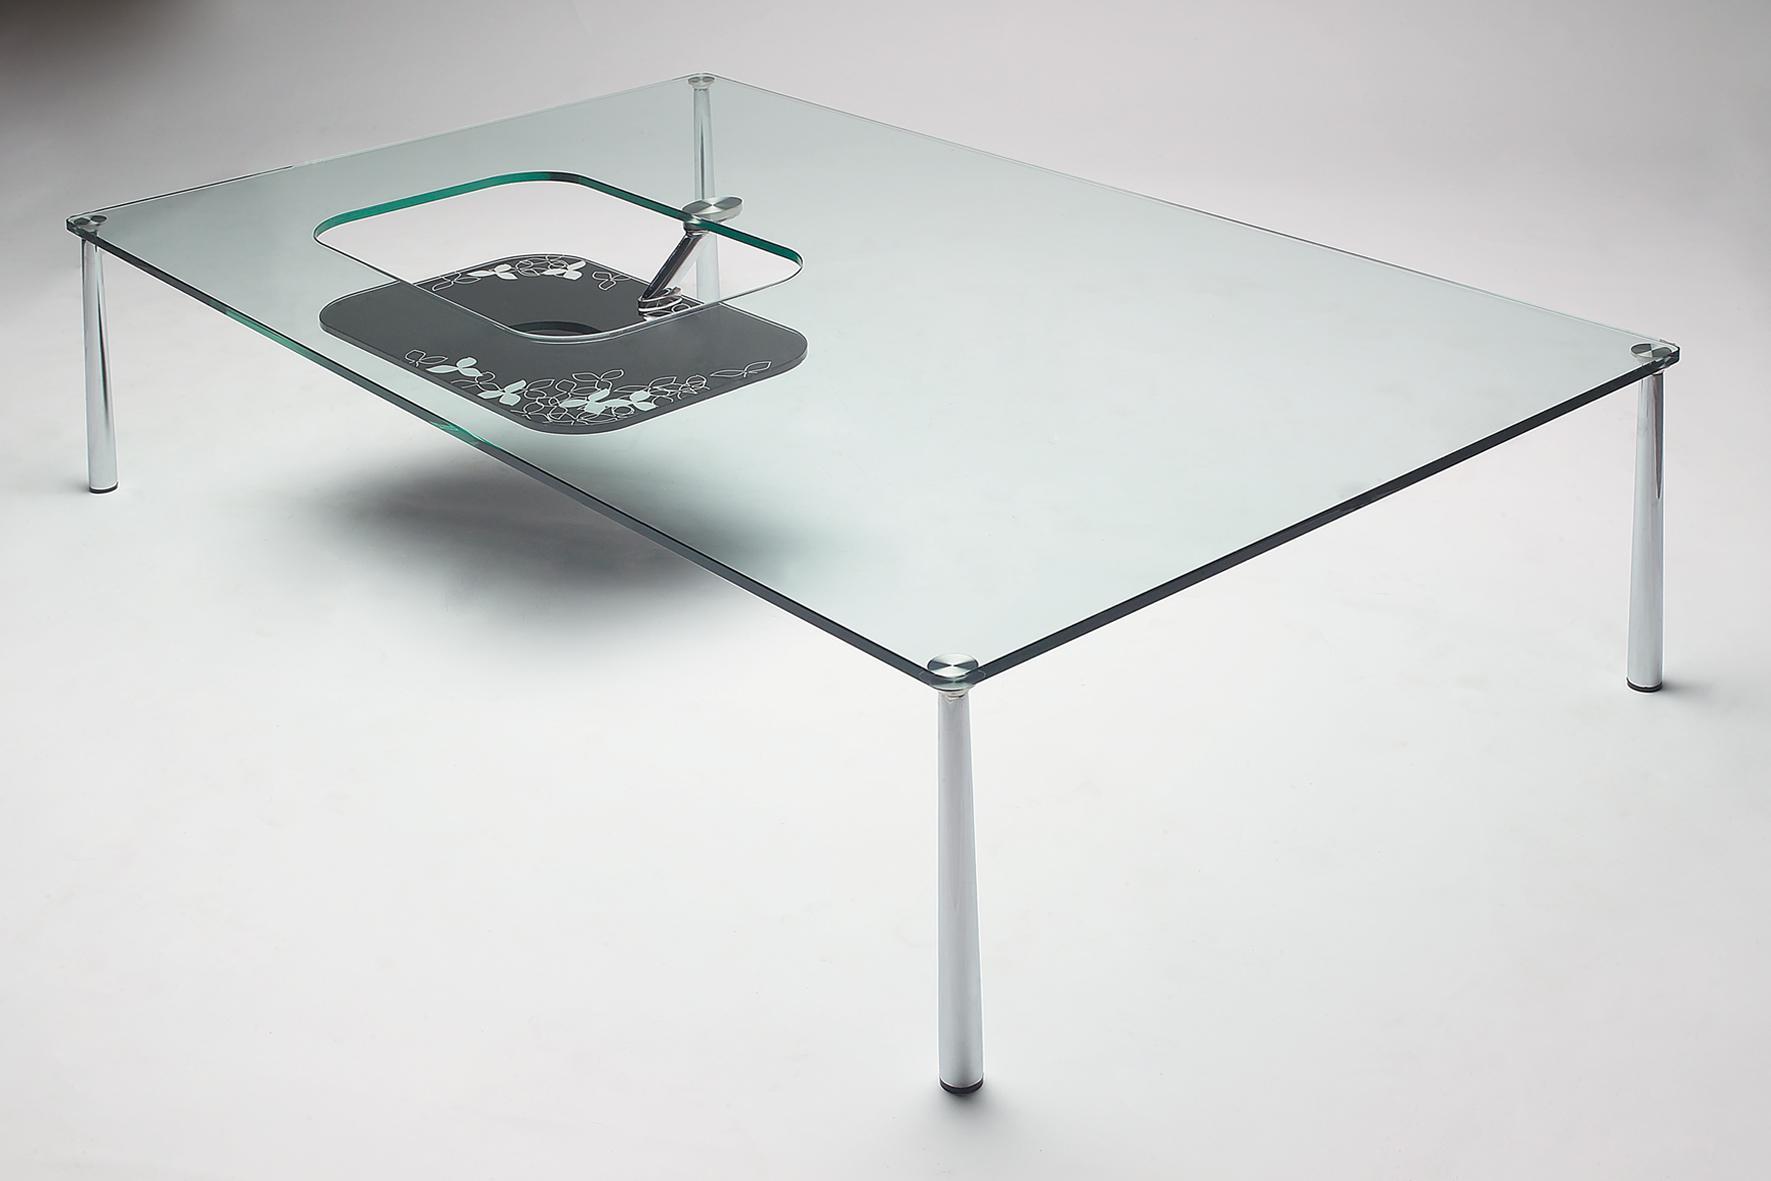 modern glass coffee table designs photo - 6